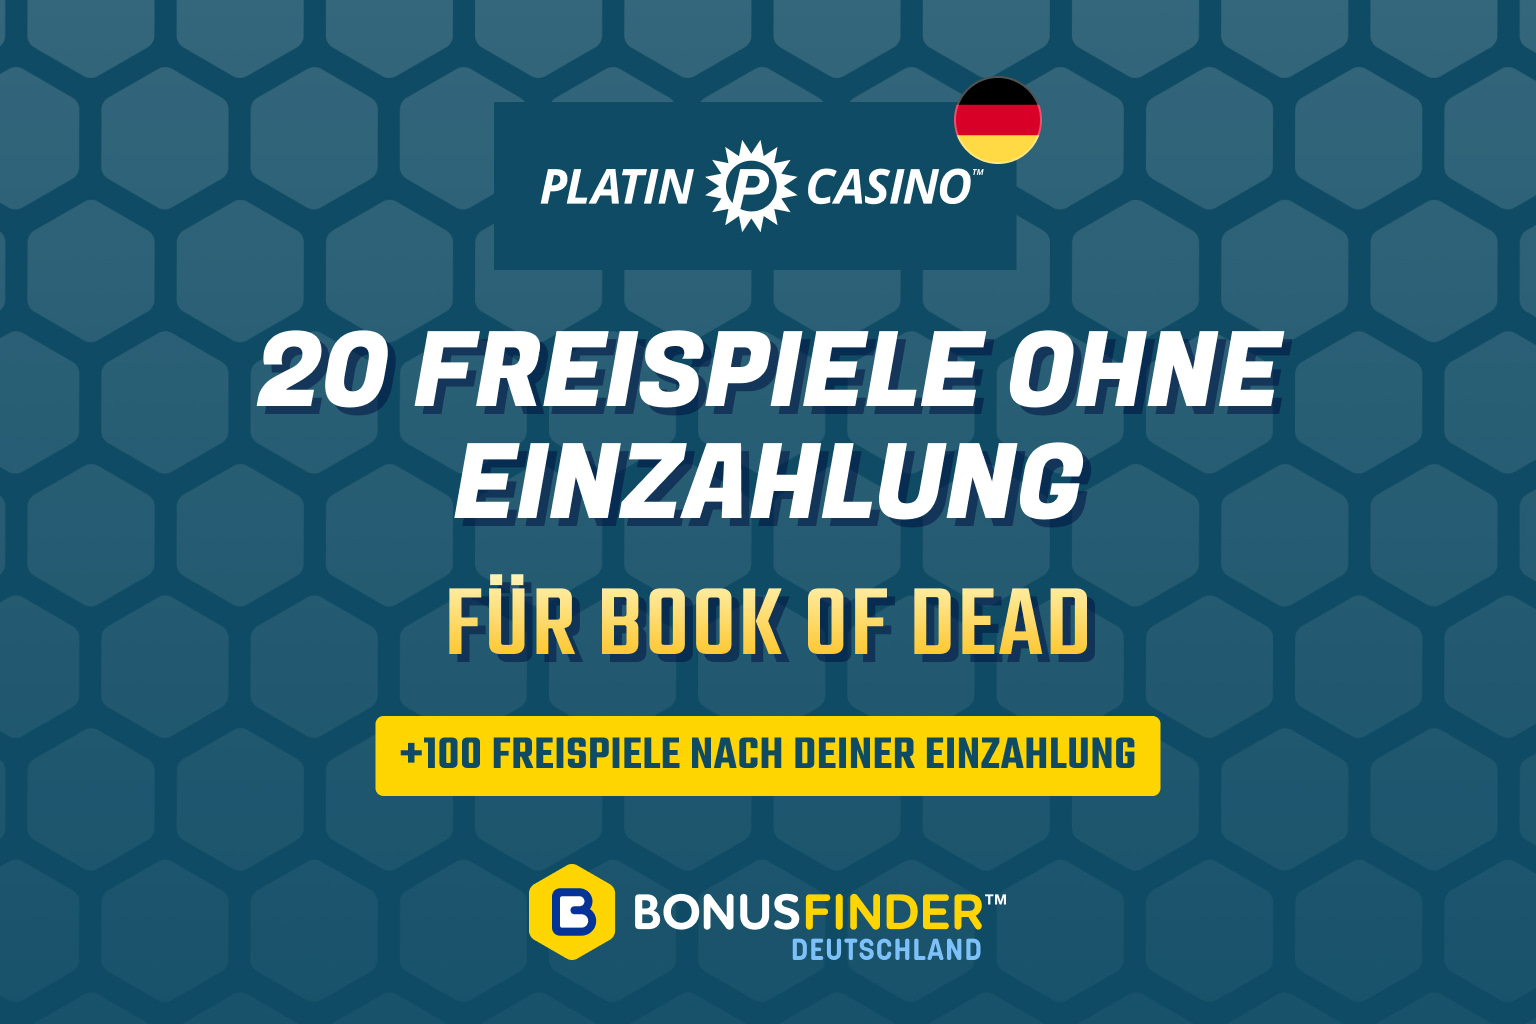 platin casino book of dead freispiele